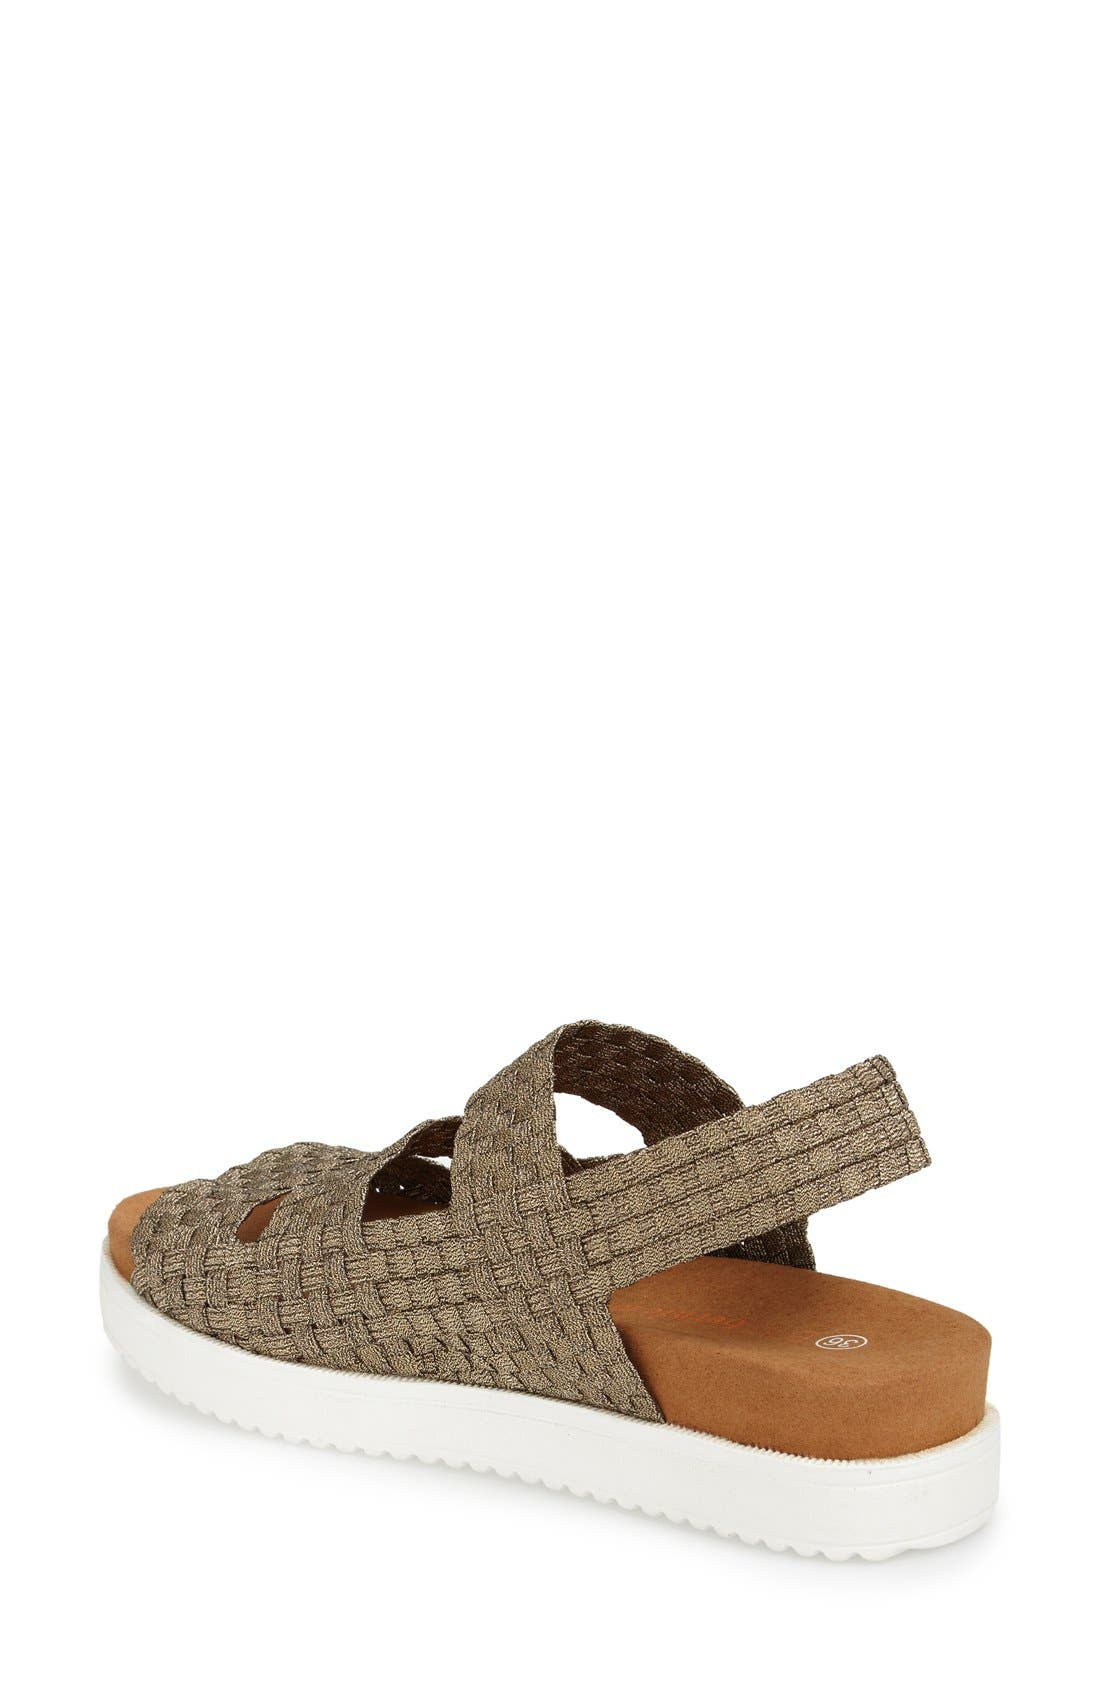 'Crisp' Woven Platform Sandal,                             Alternate thumbnail 2, color,                             BRONZE FABRIC